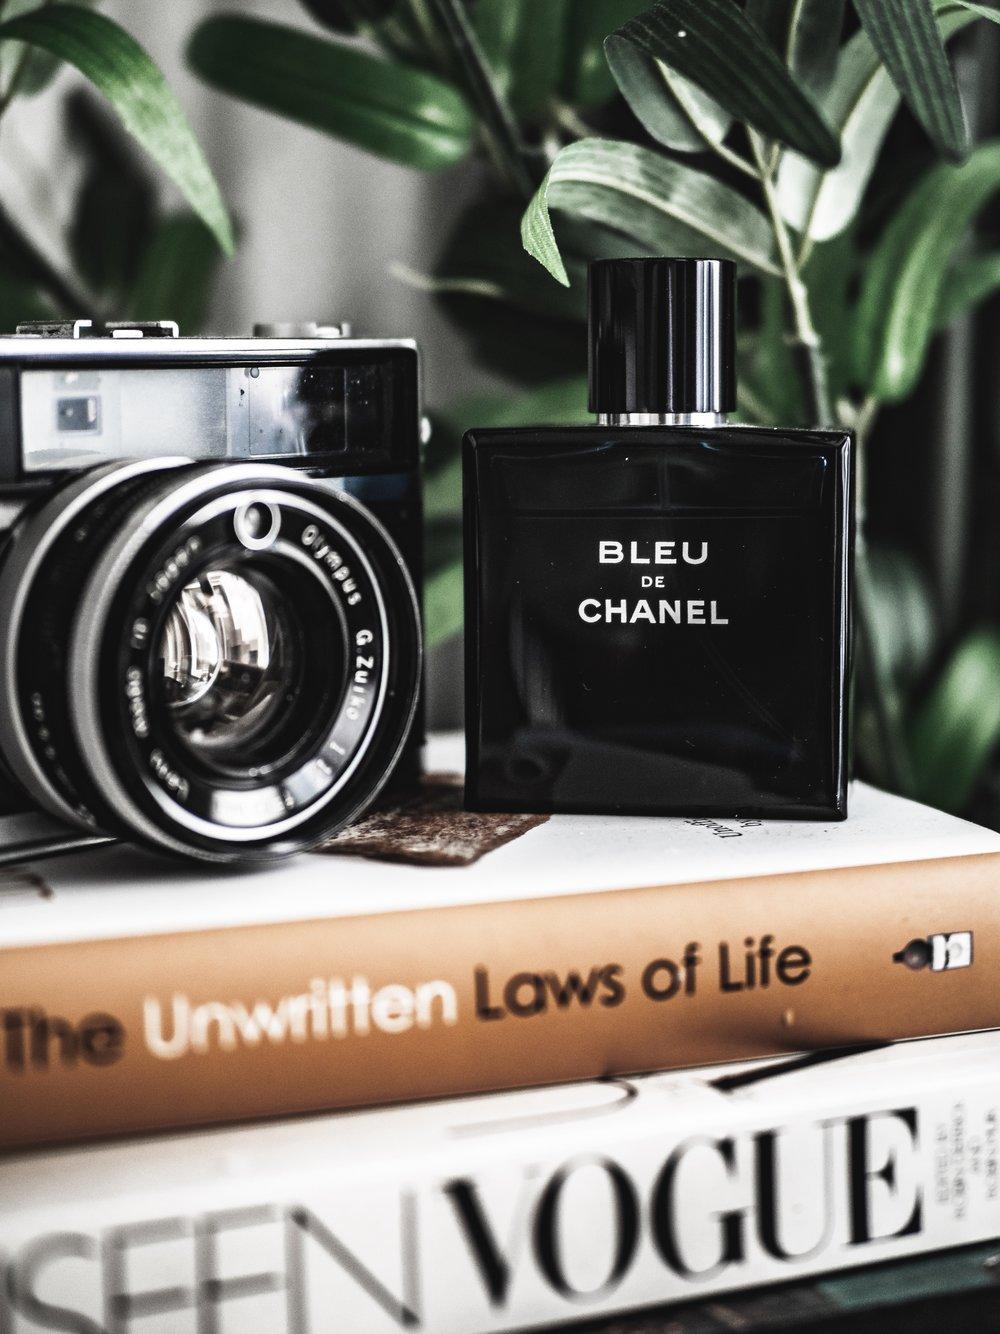 Bleu de Chanel Fragrance Review